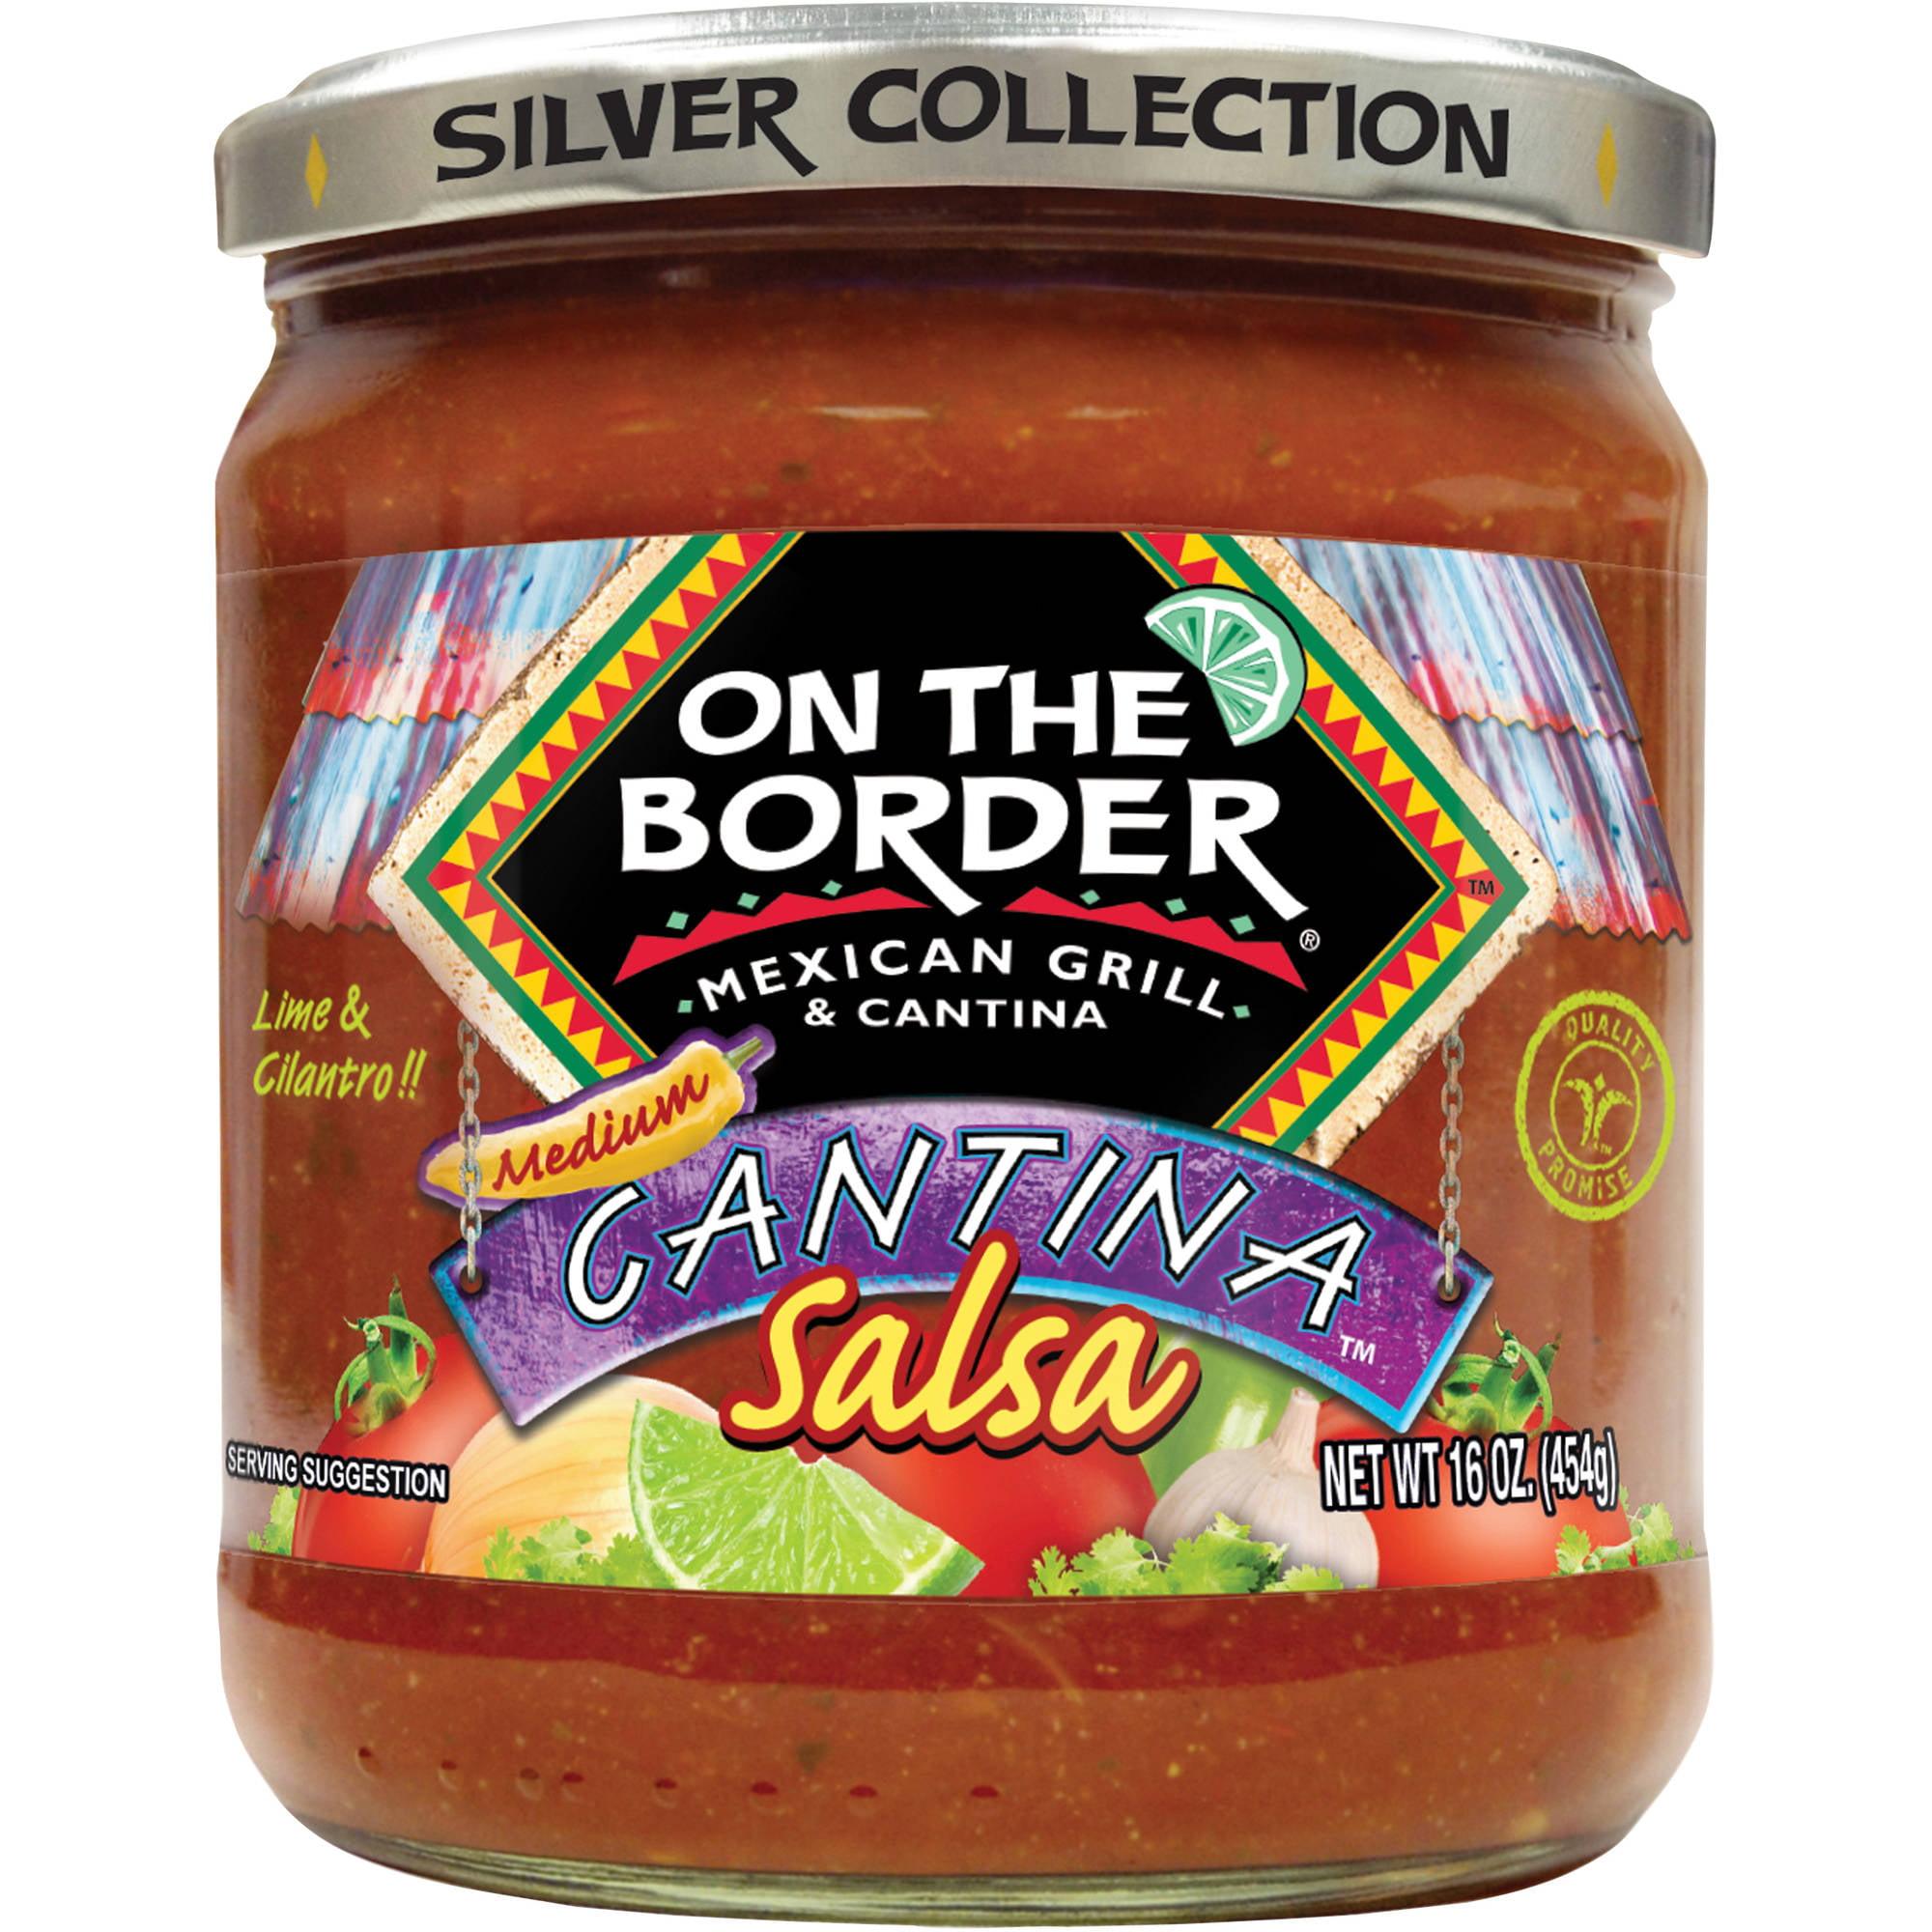 On The Border Cantina Medium Salsa, 16 oz